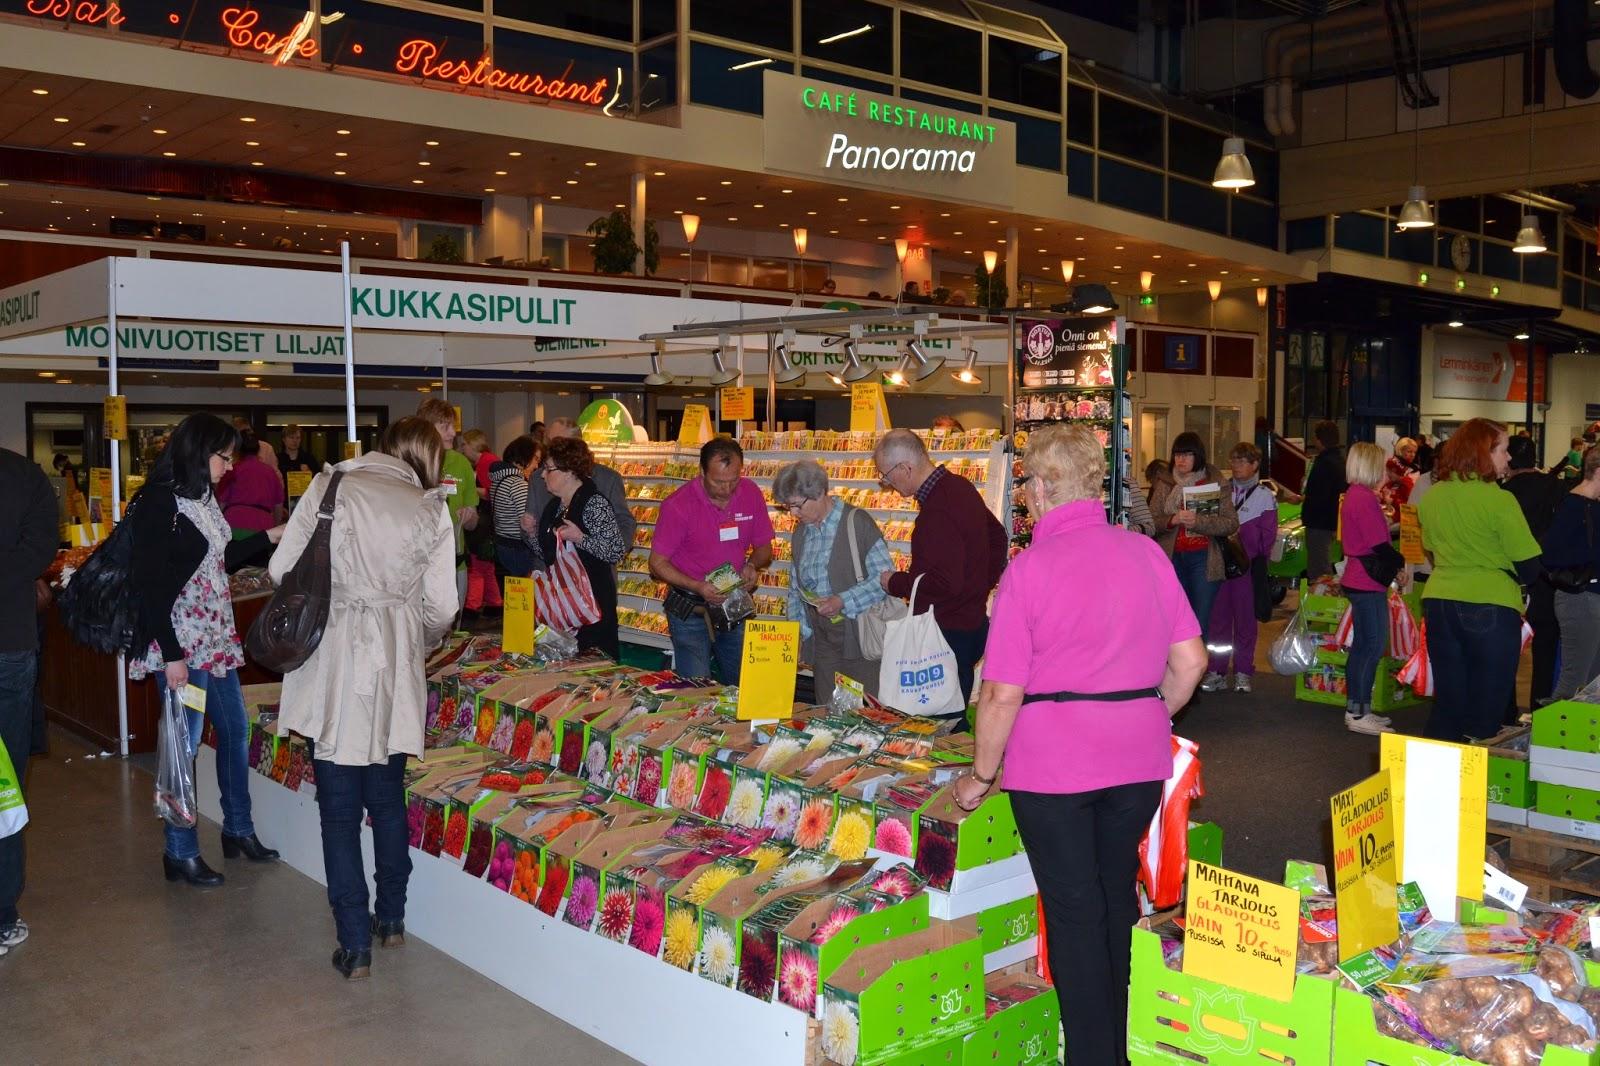 Helsingin puutarhamessut – Garden fair in Helsinki